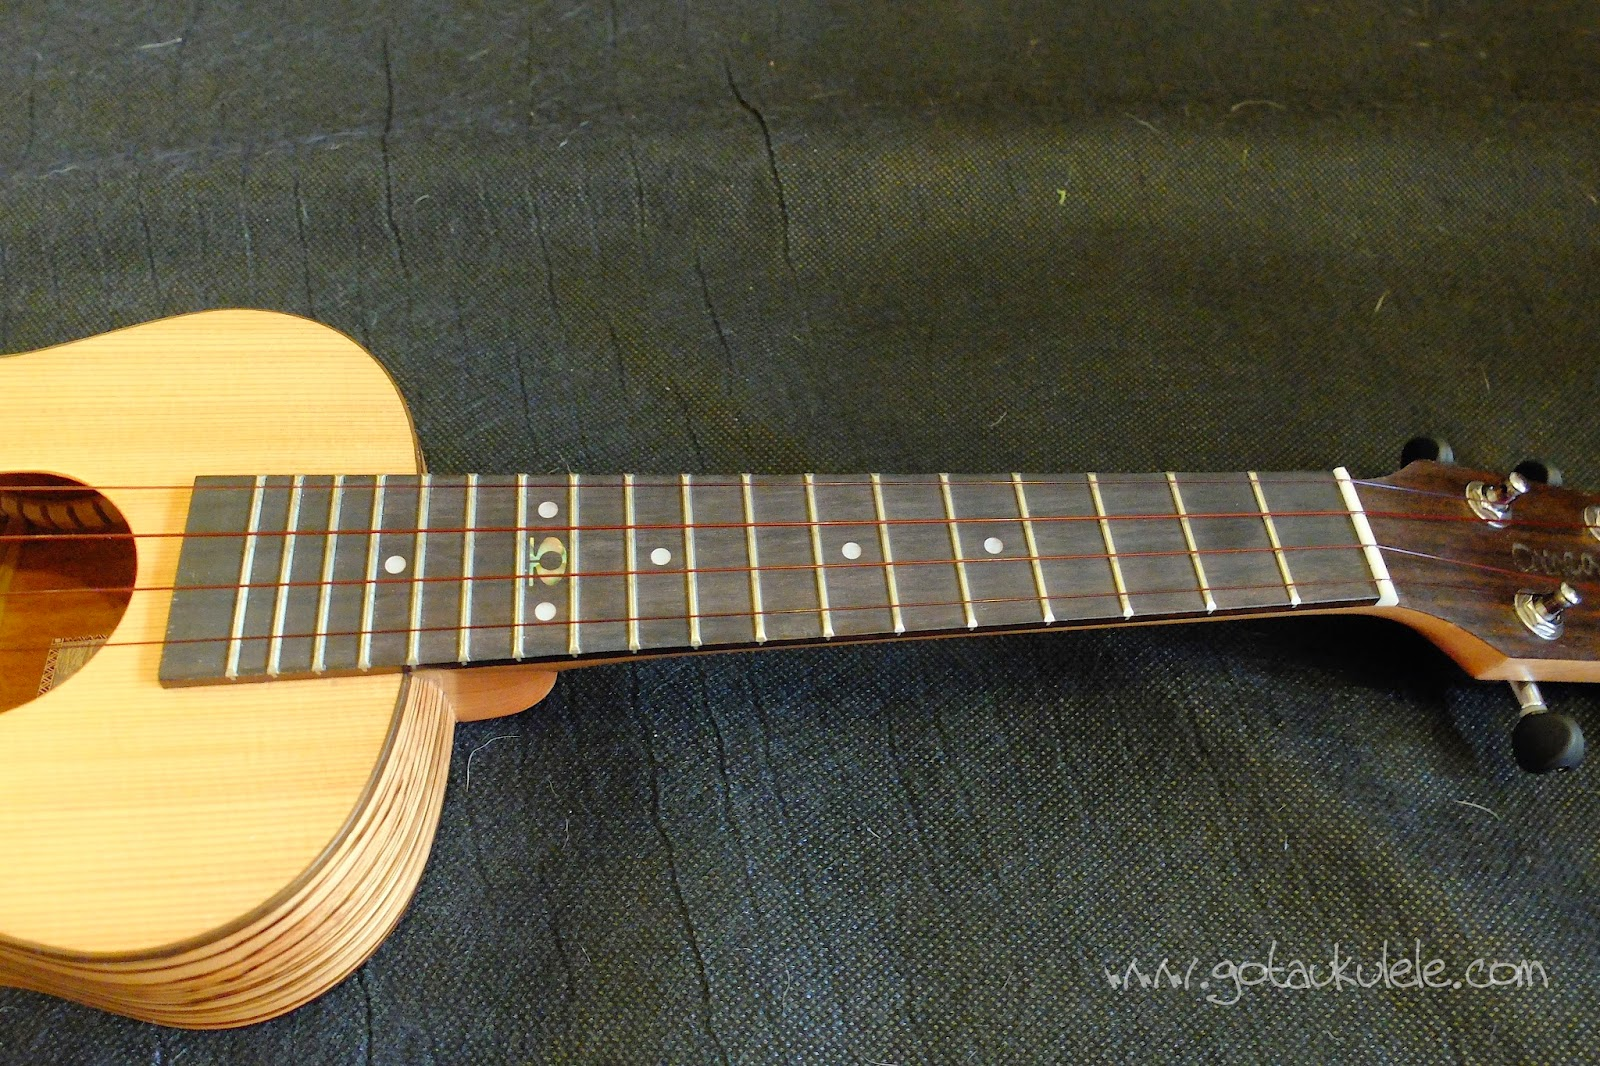 Omega Zedro II Concert Ukulele full fingerboard